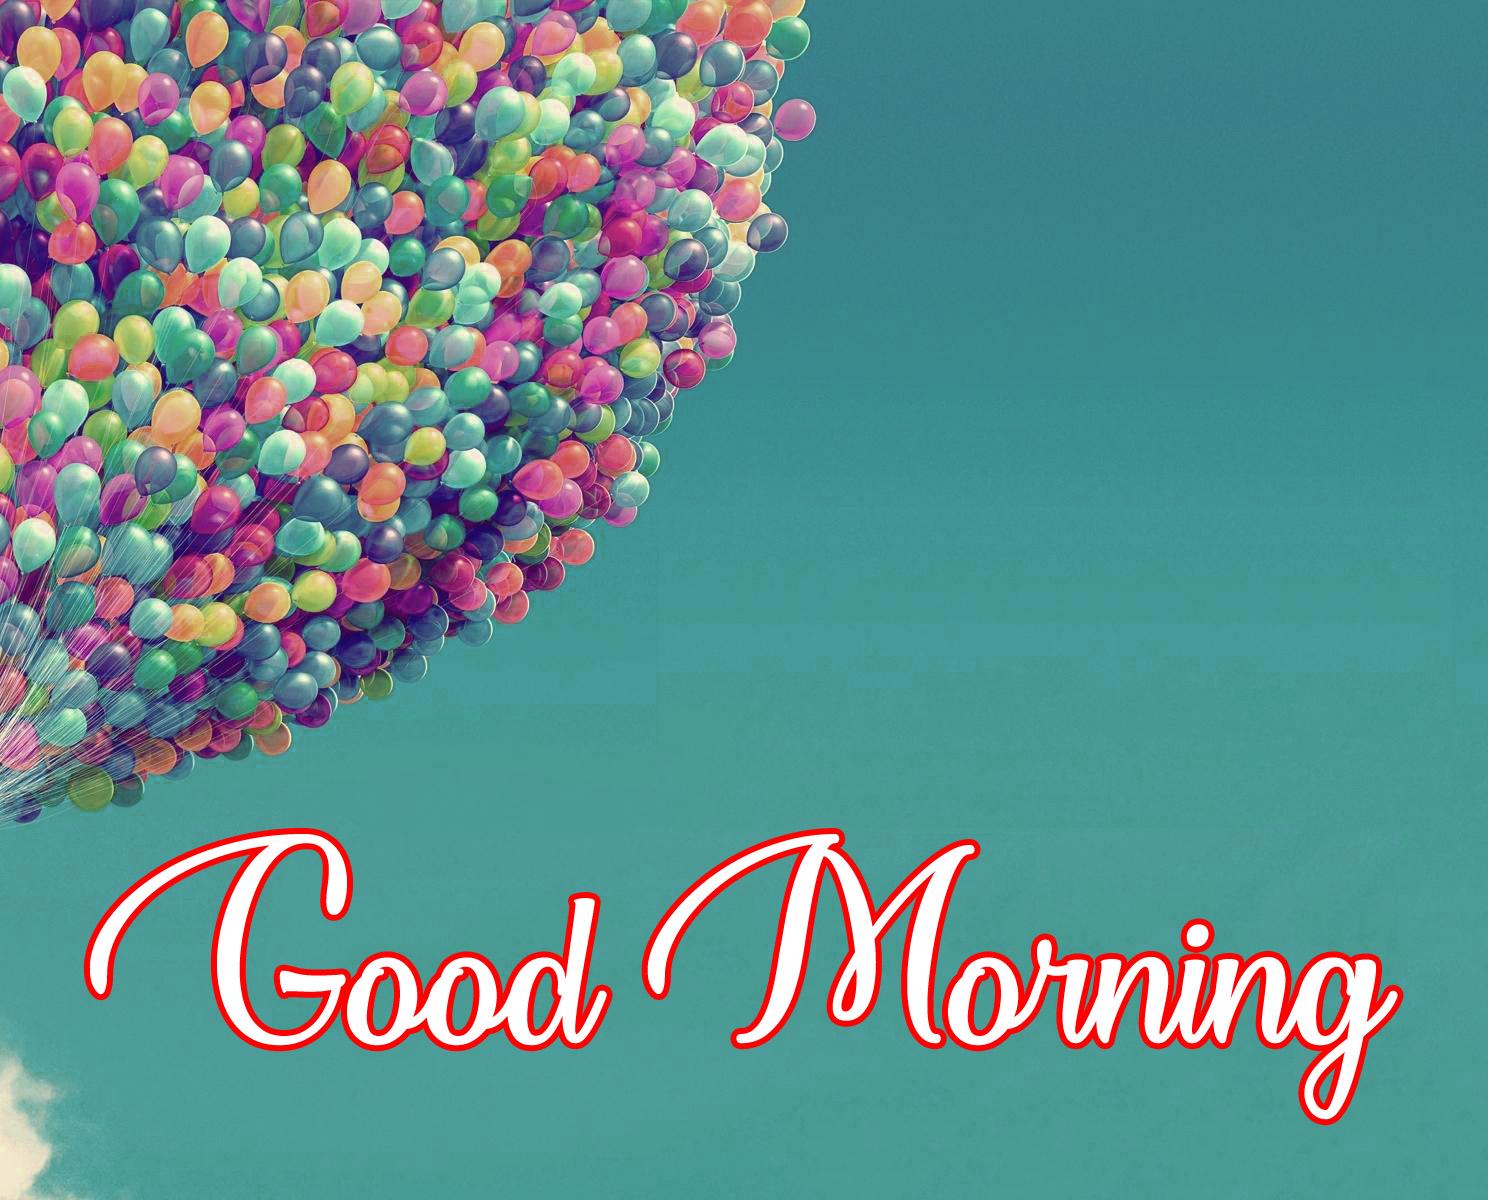 world good morning Images 12